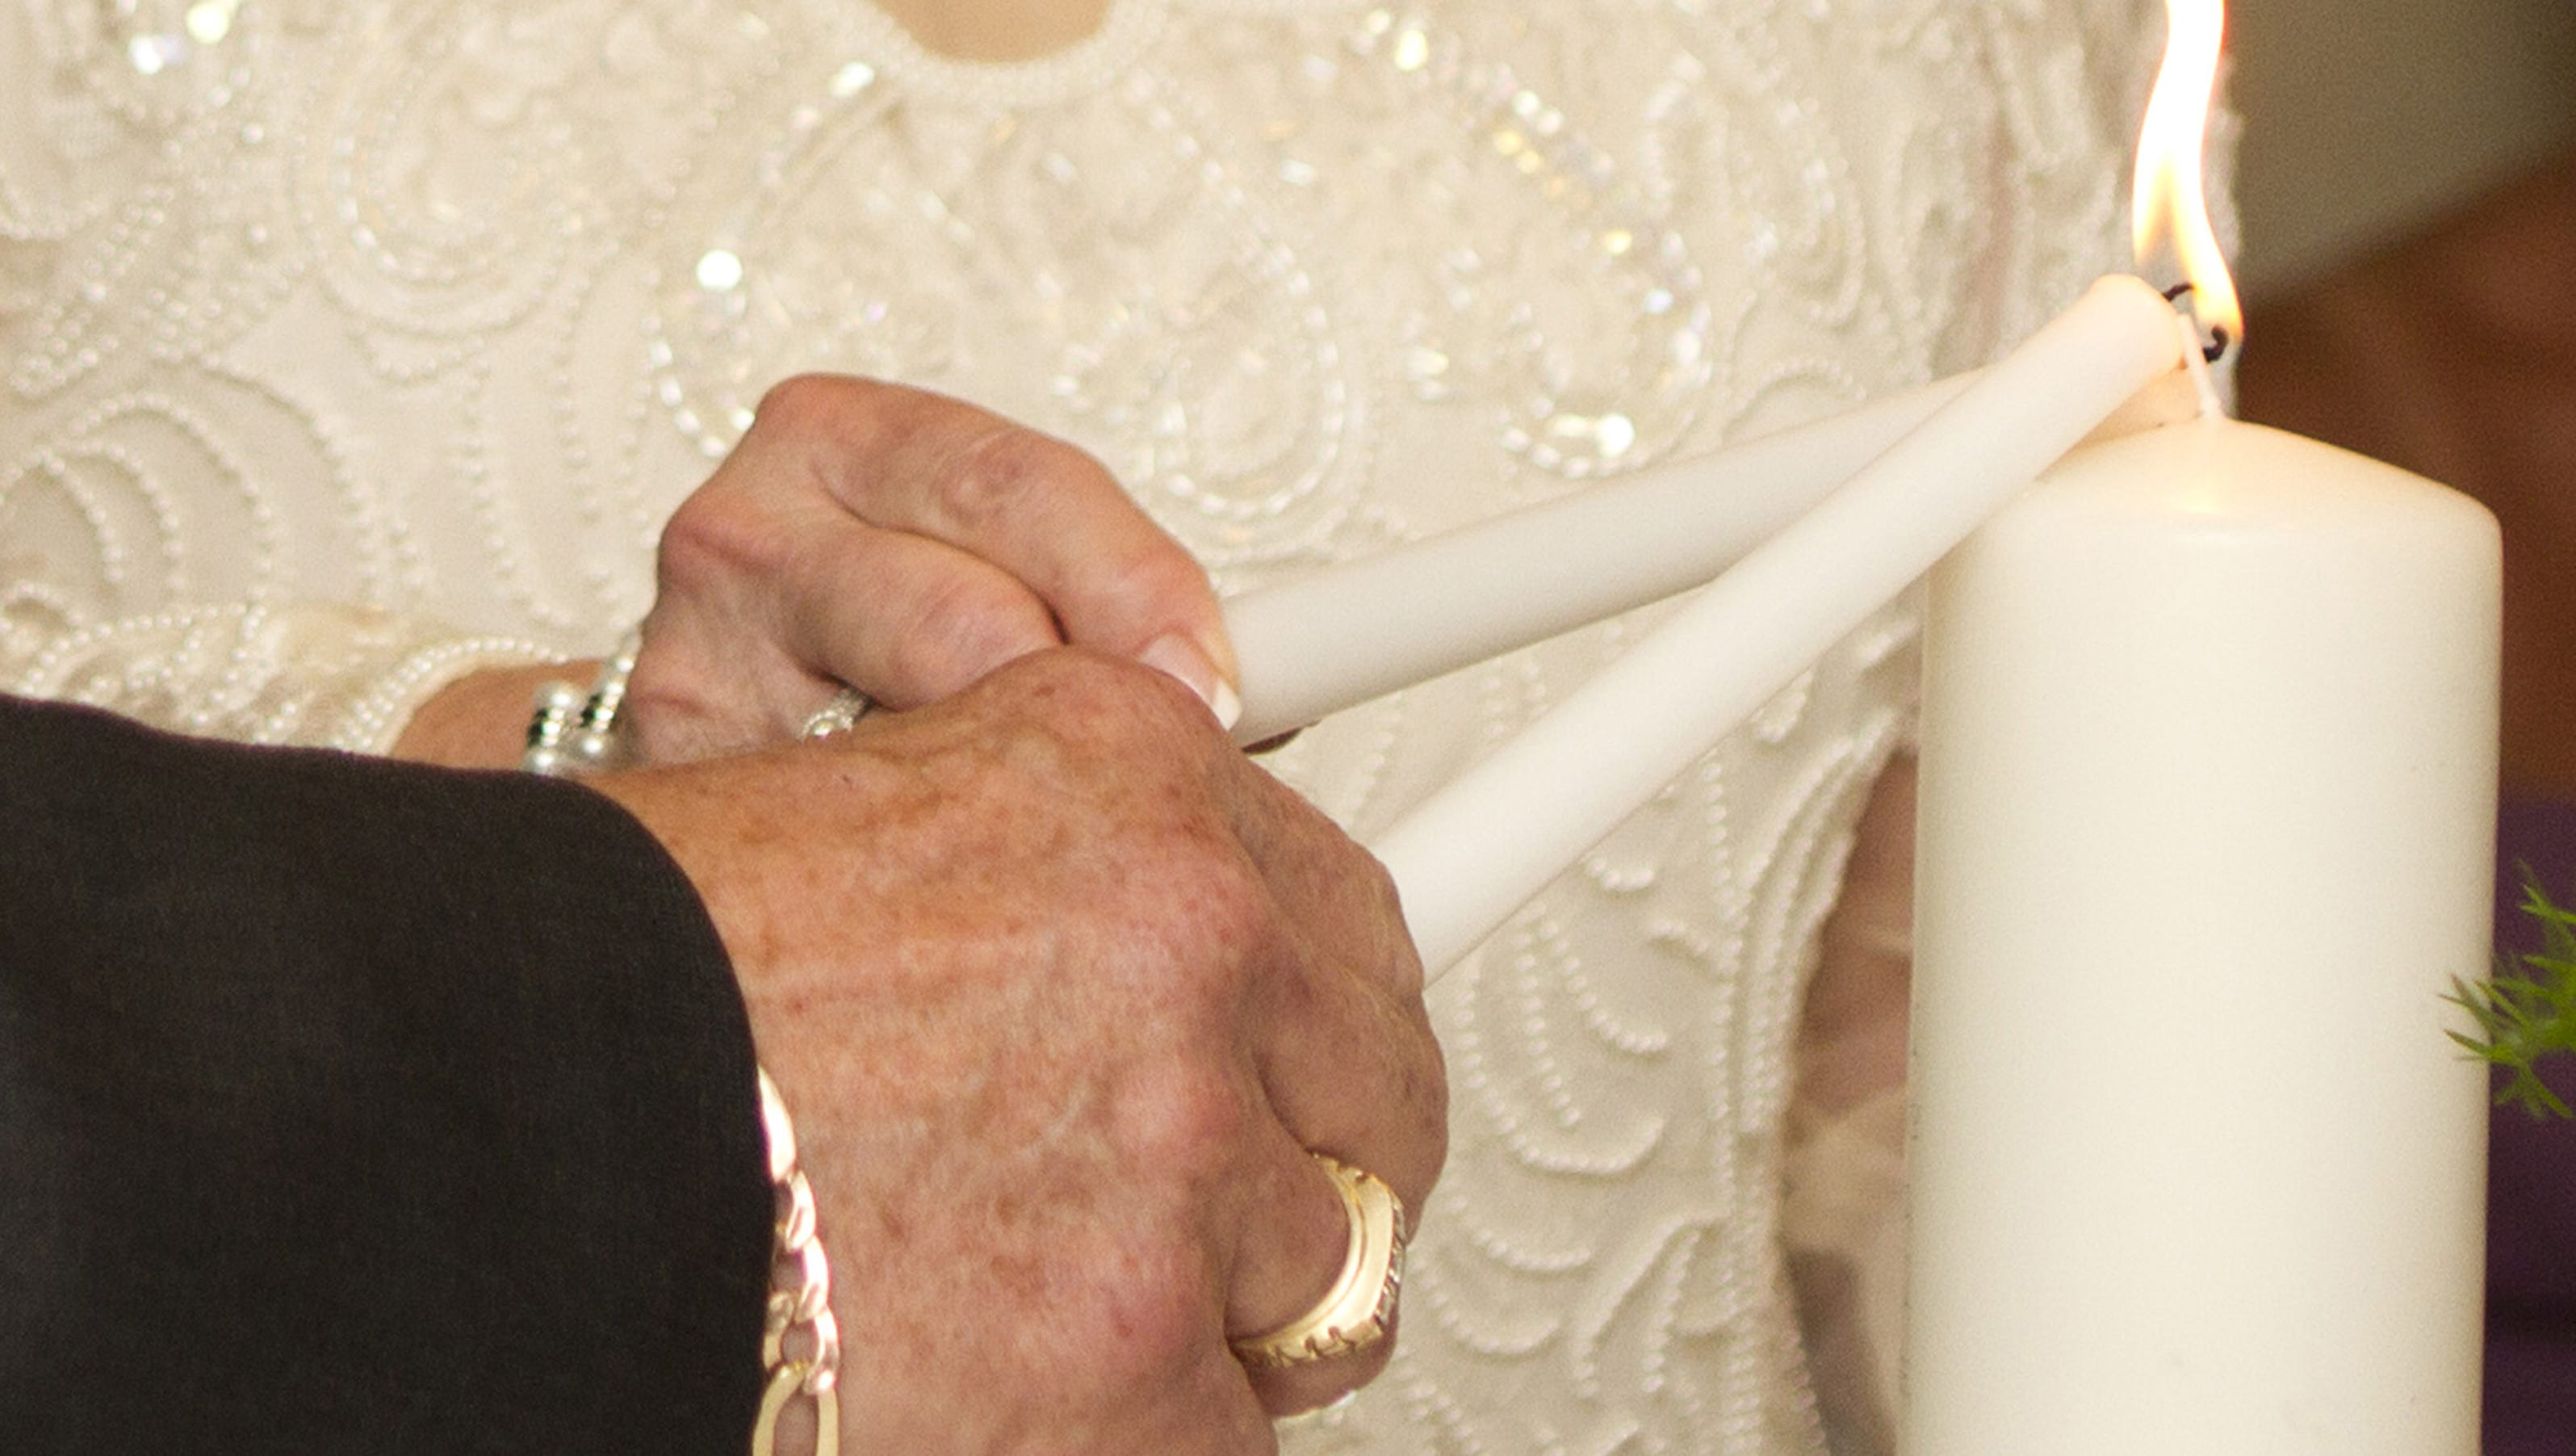 Aarp senior dating service 8